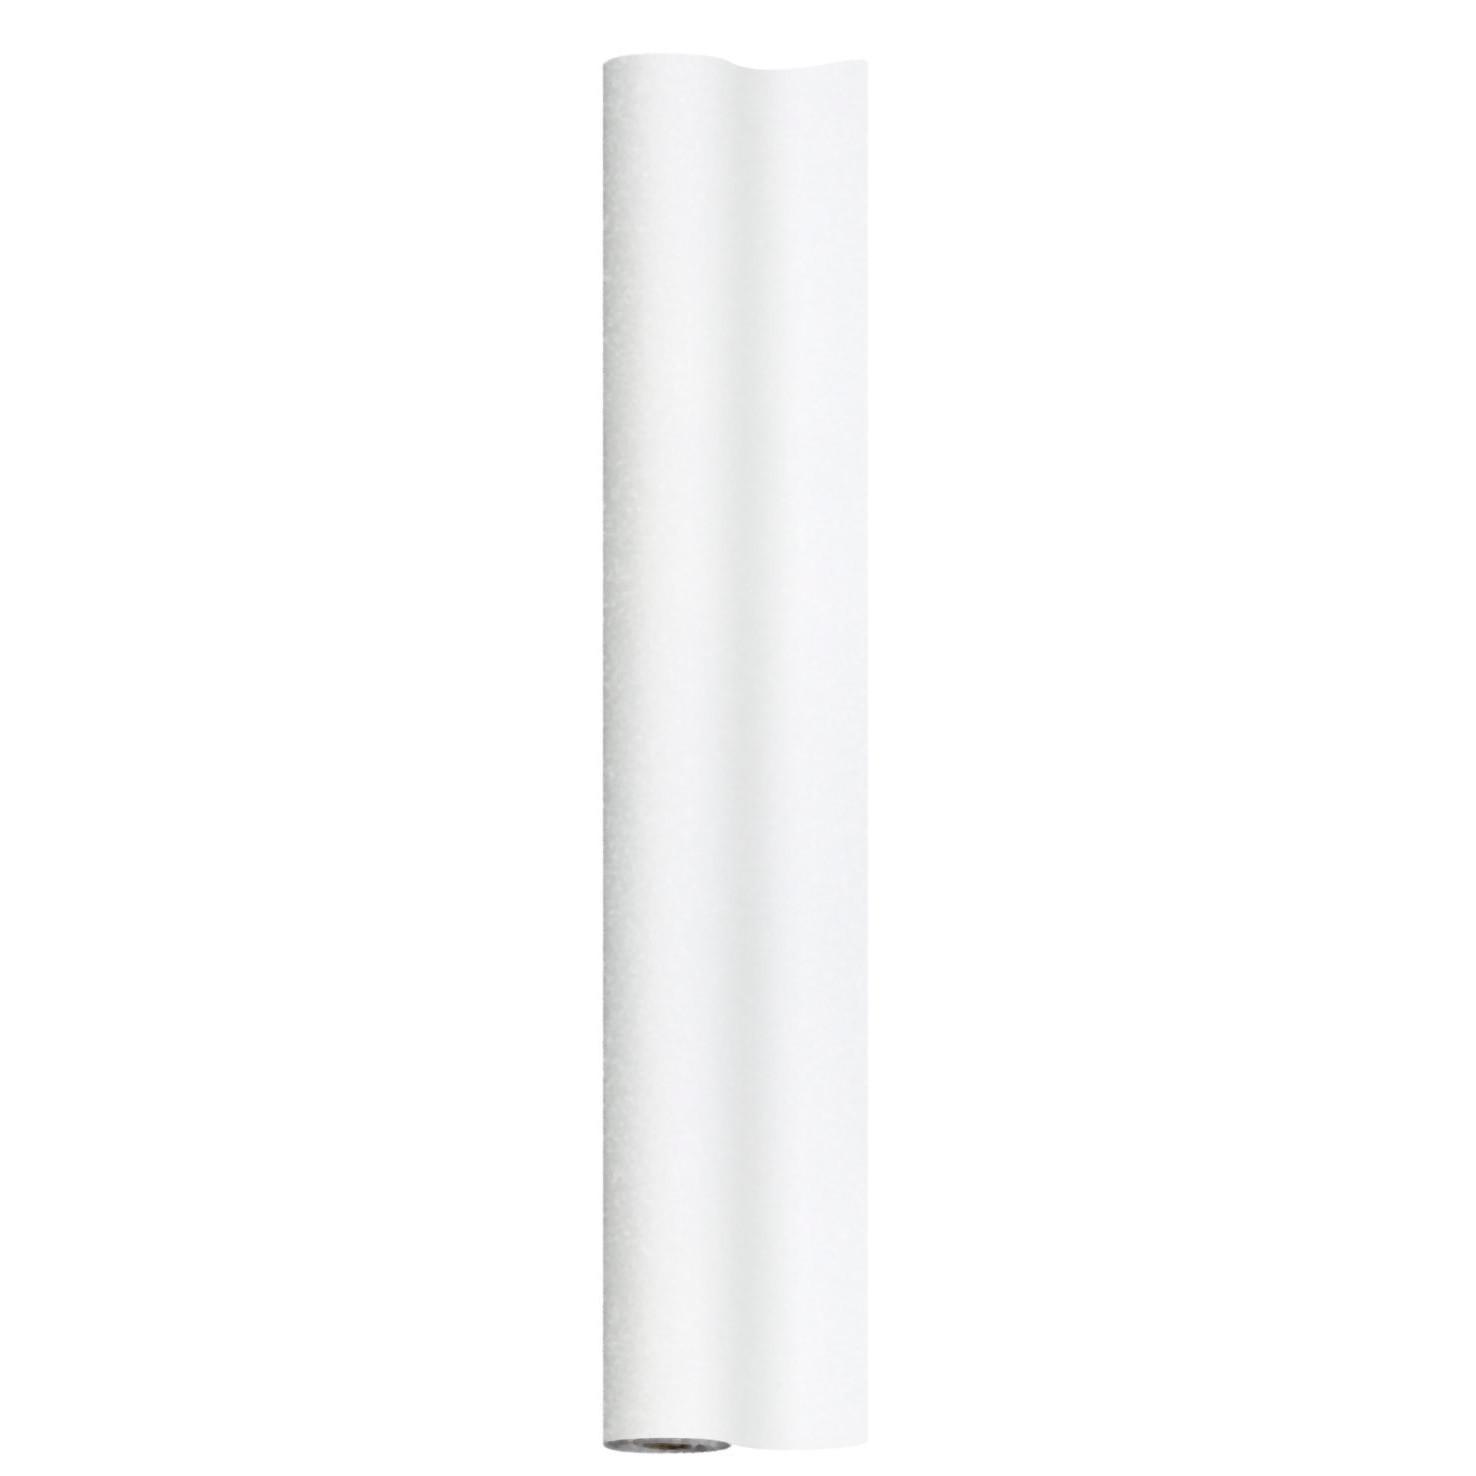 Rulledug Dunicel Essential - hvid 1,20 x 25 meter